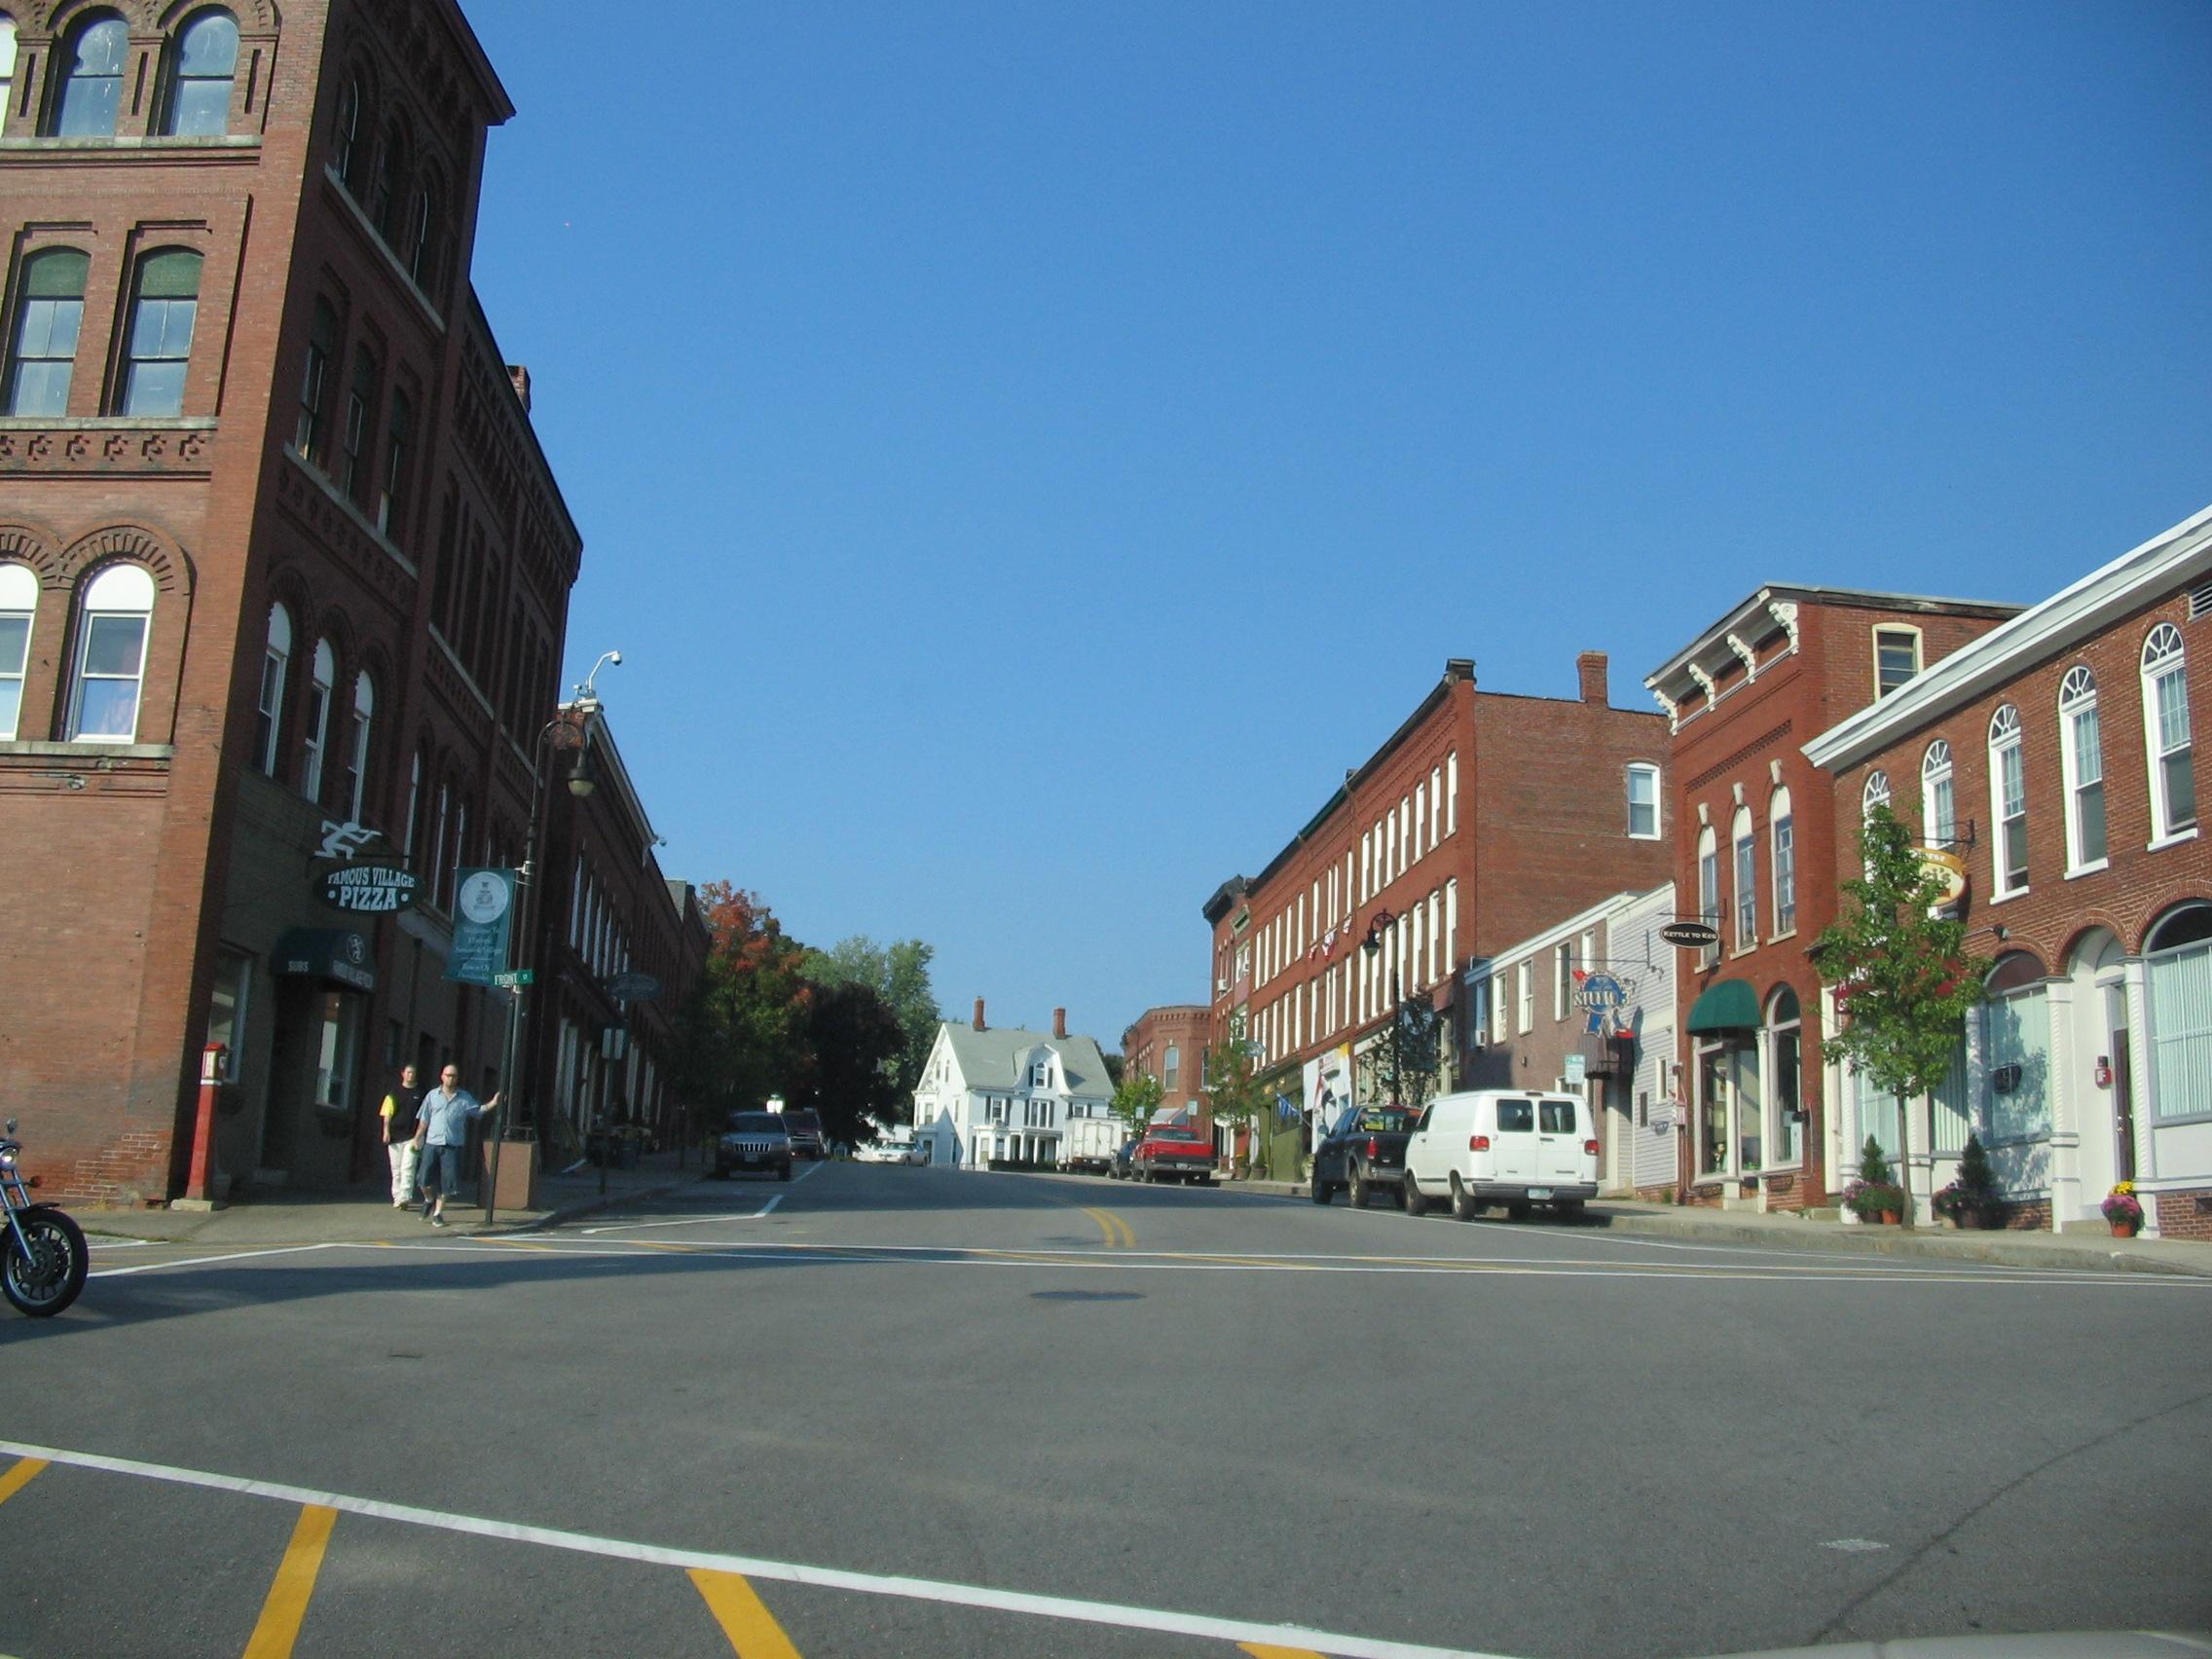 09-21-07 New Hampshire (4)